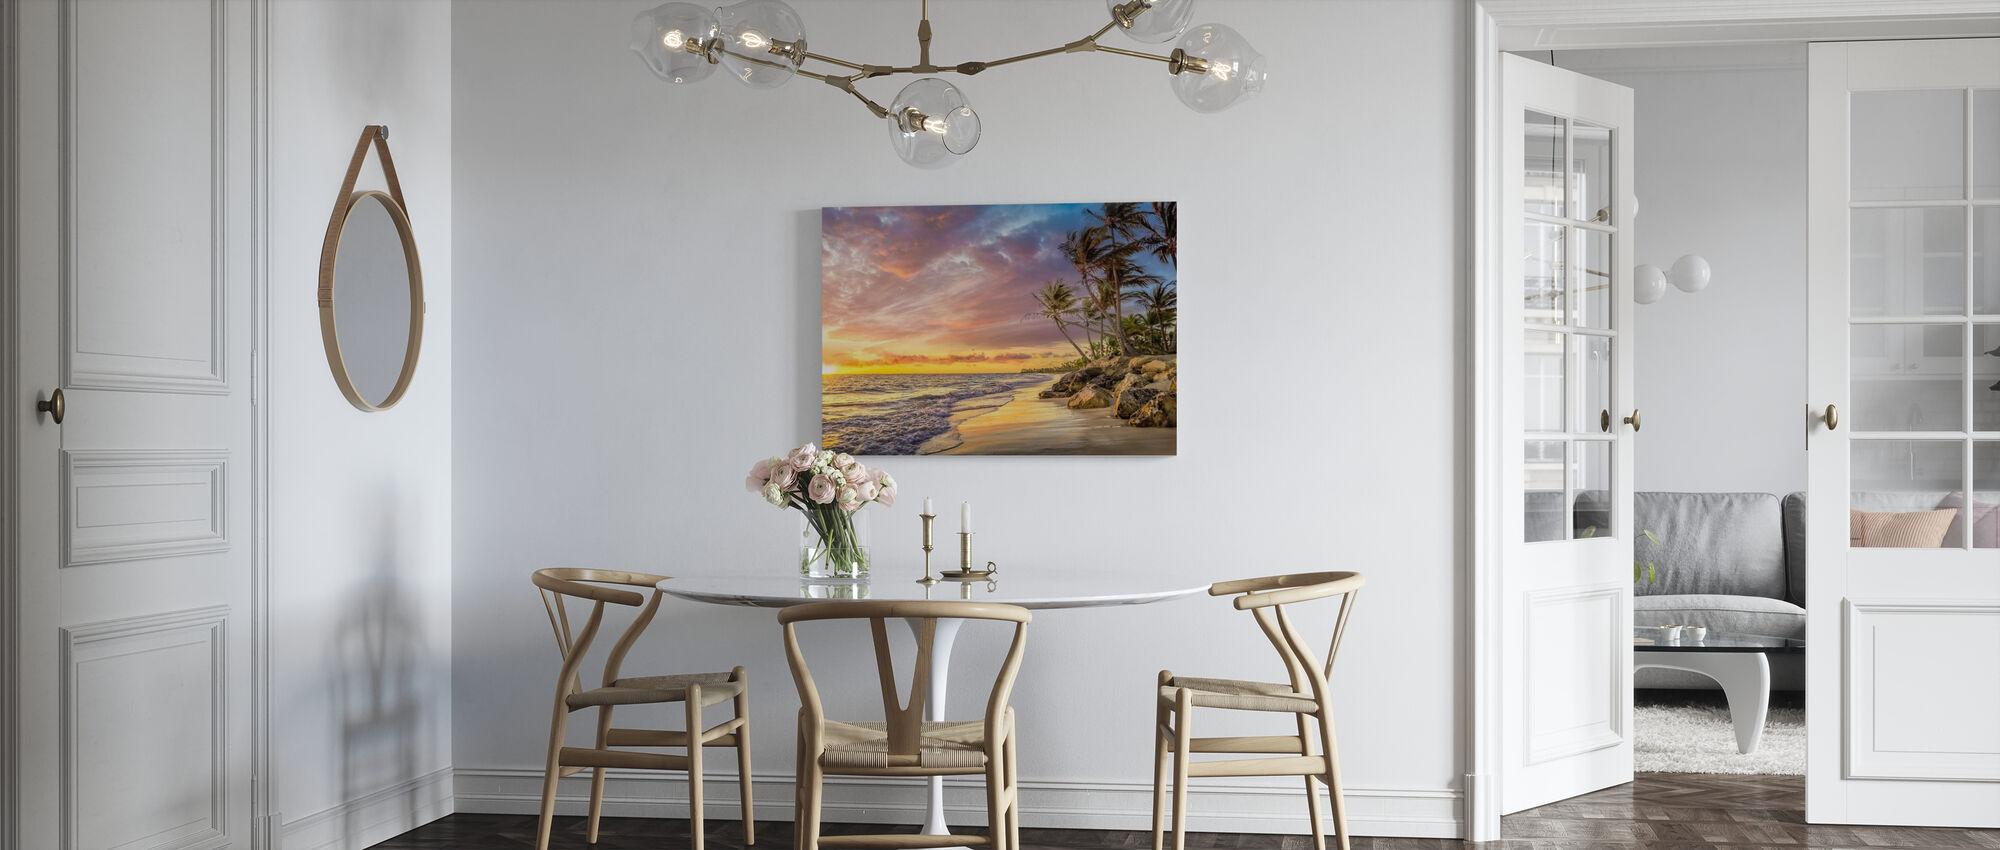 Palm i solnedgången - Canvastavla - Kök